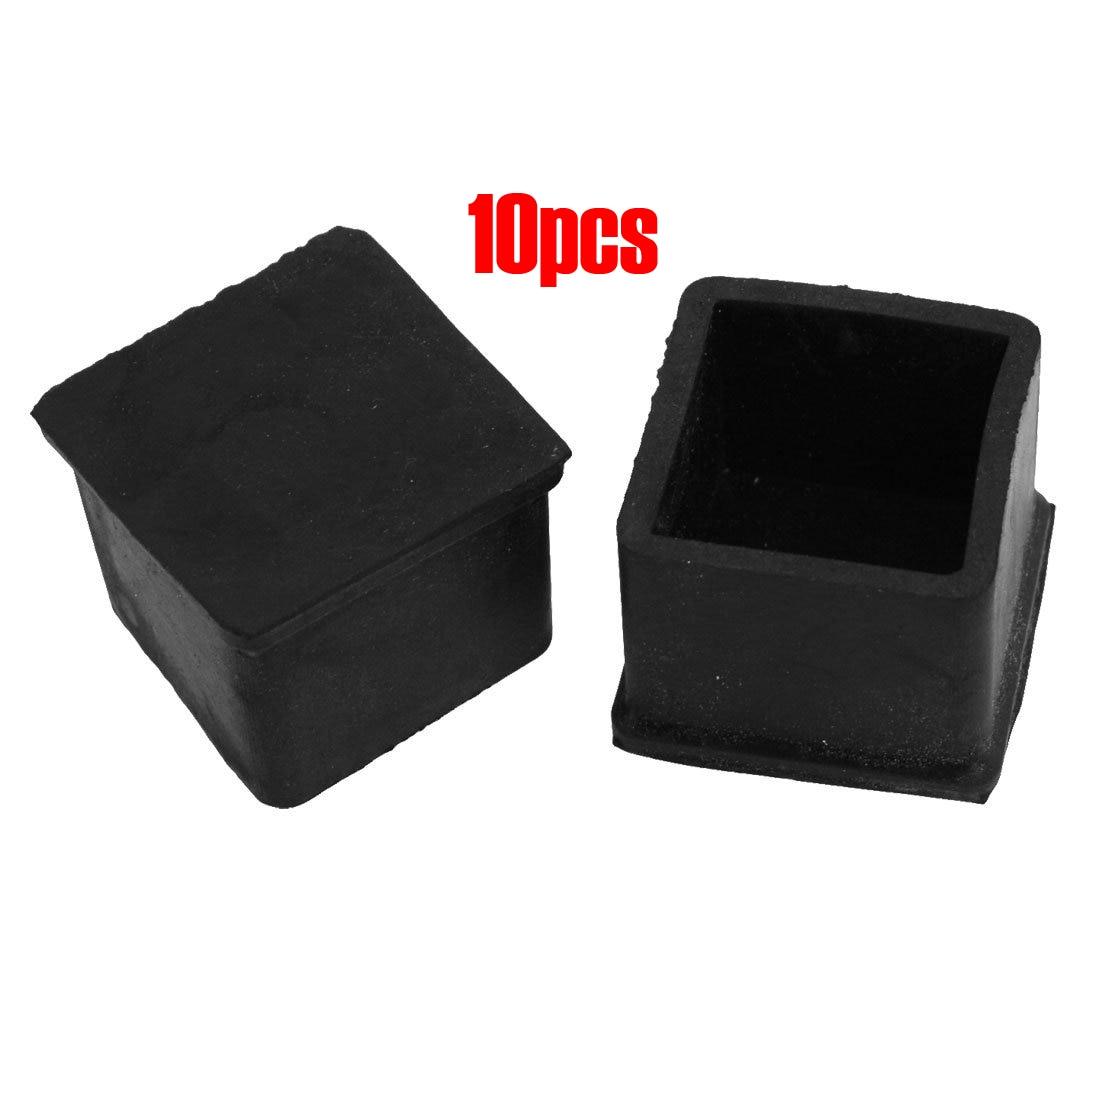 цена на SZS Hot 10 Pcs Black 30mm x 30mm Furniture Foot Protector Square Rubber Covers case Free Shipping